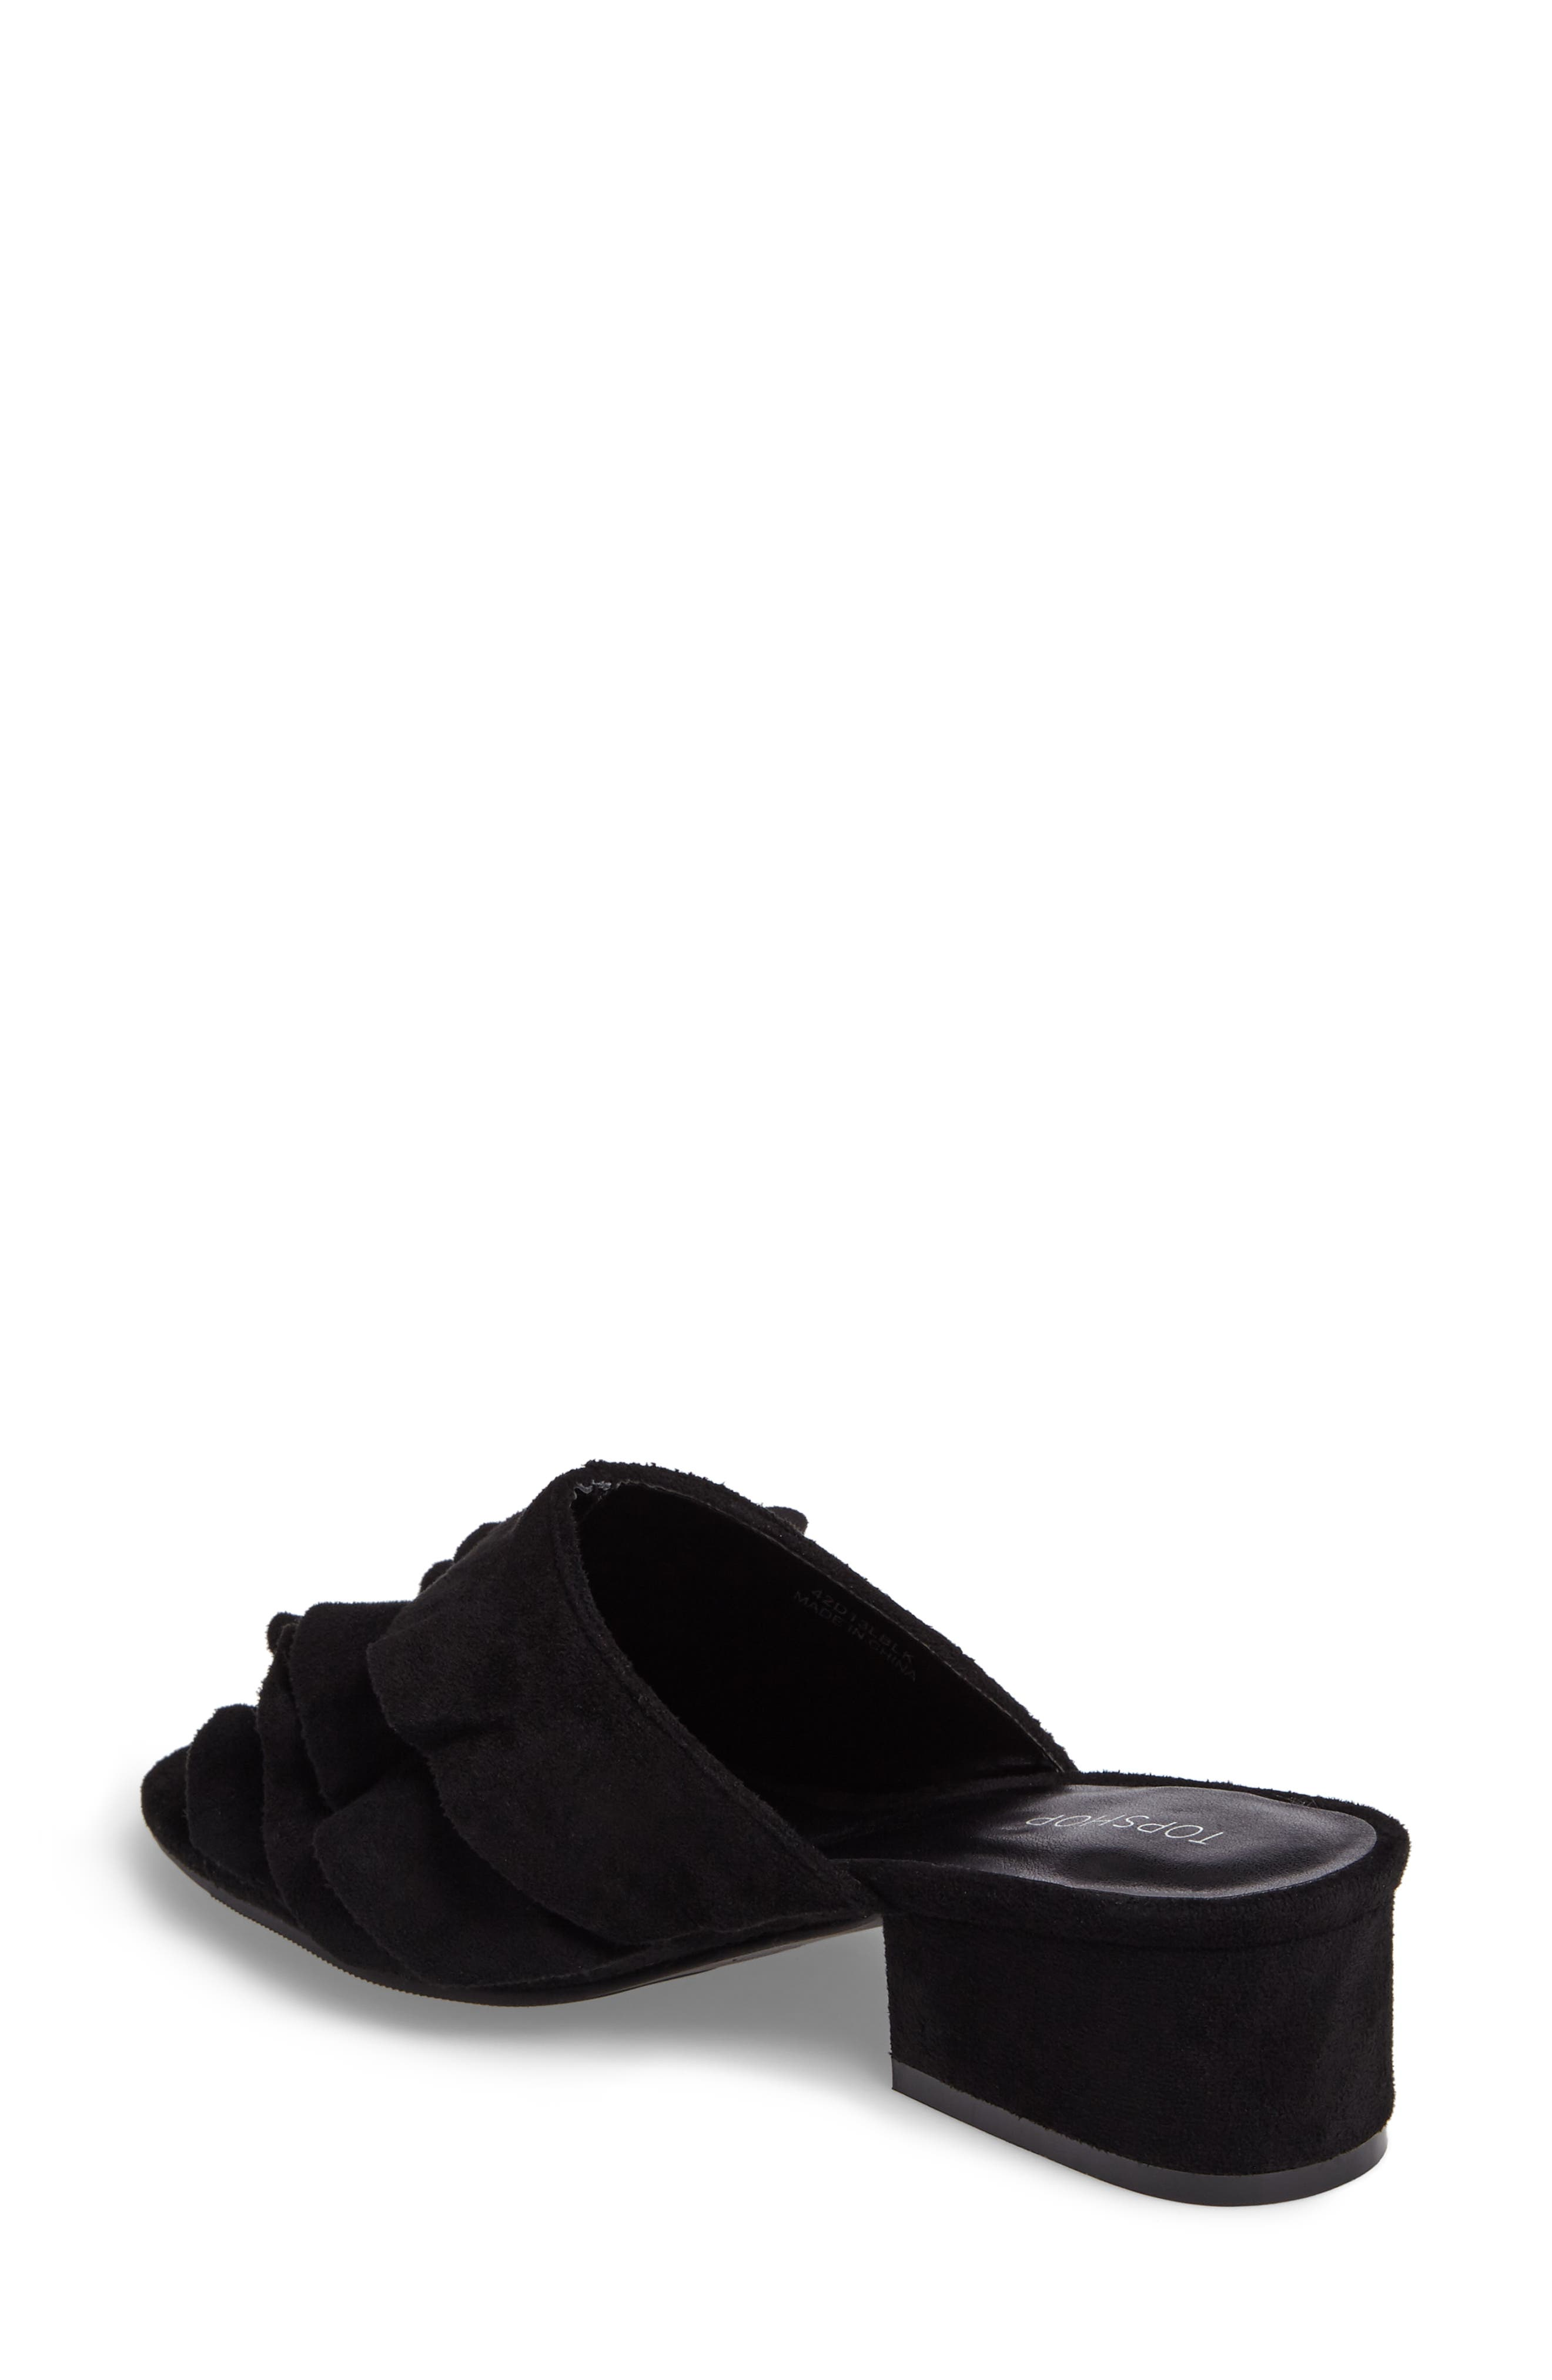 Alternate Image 2  - Topshop Darcy Ruffle Slide Sandal (Women)